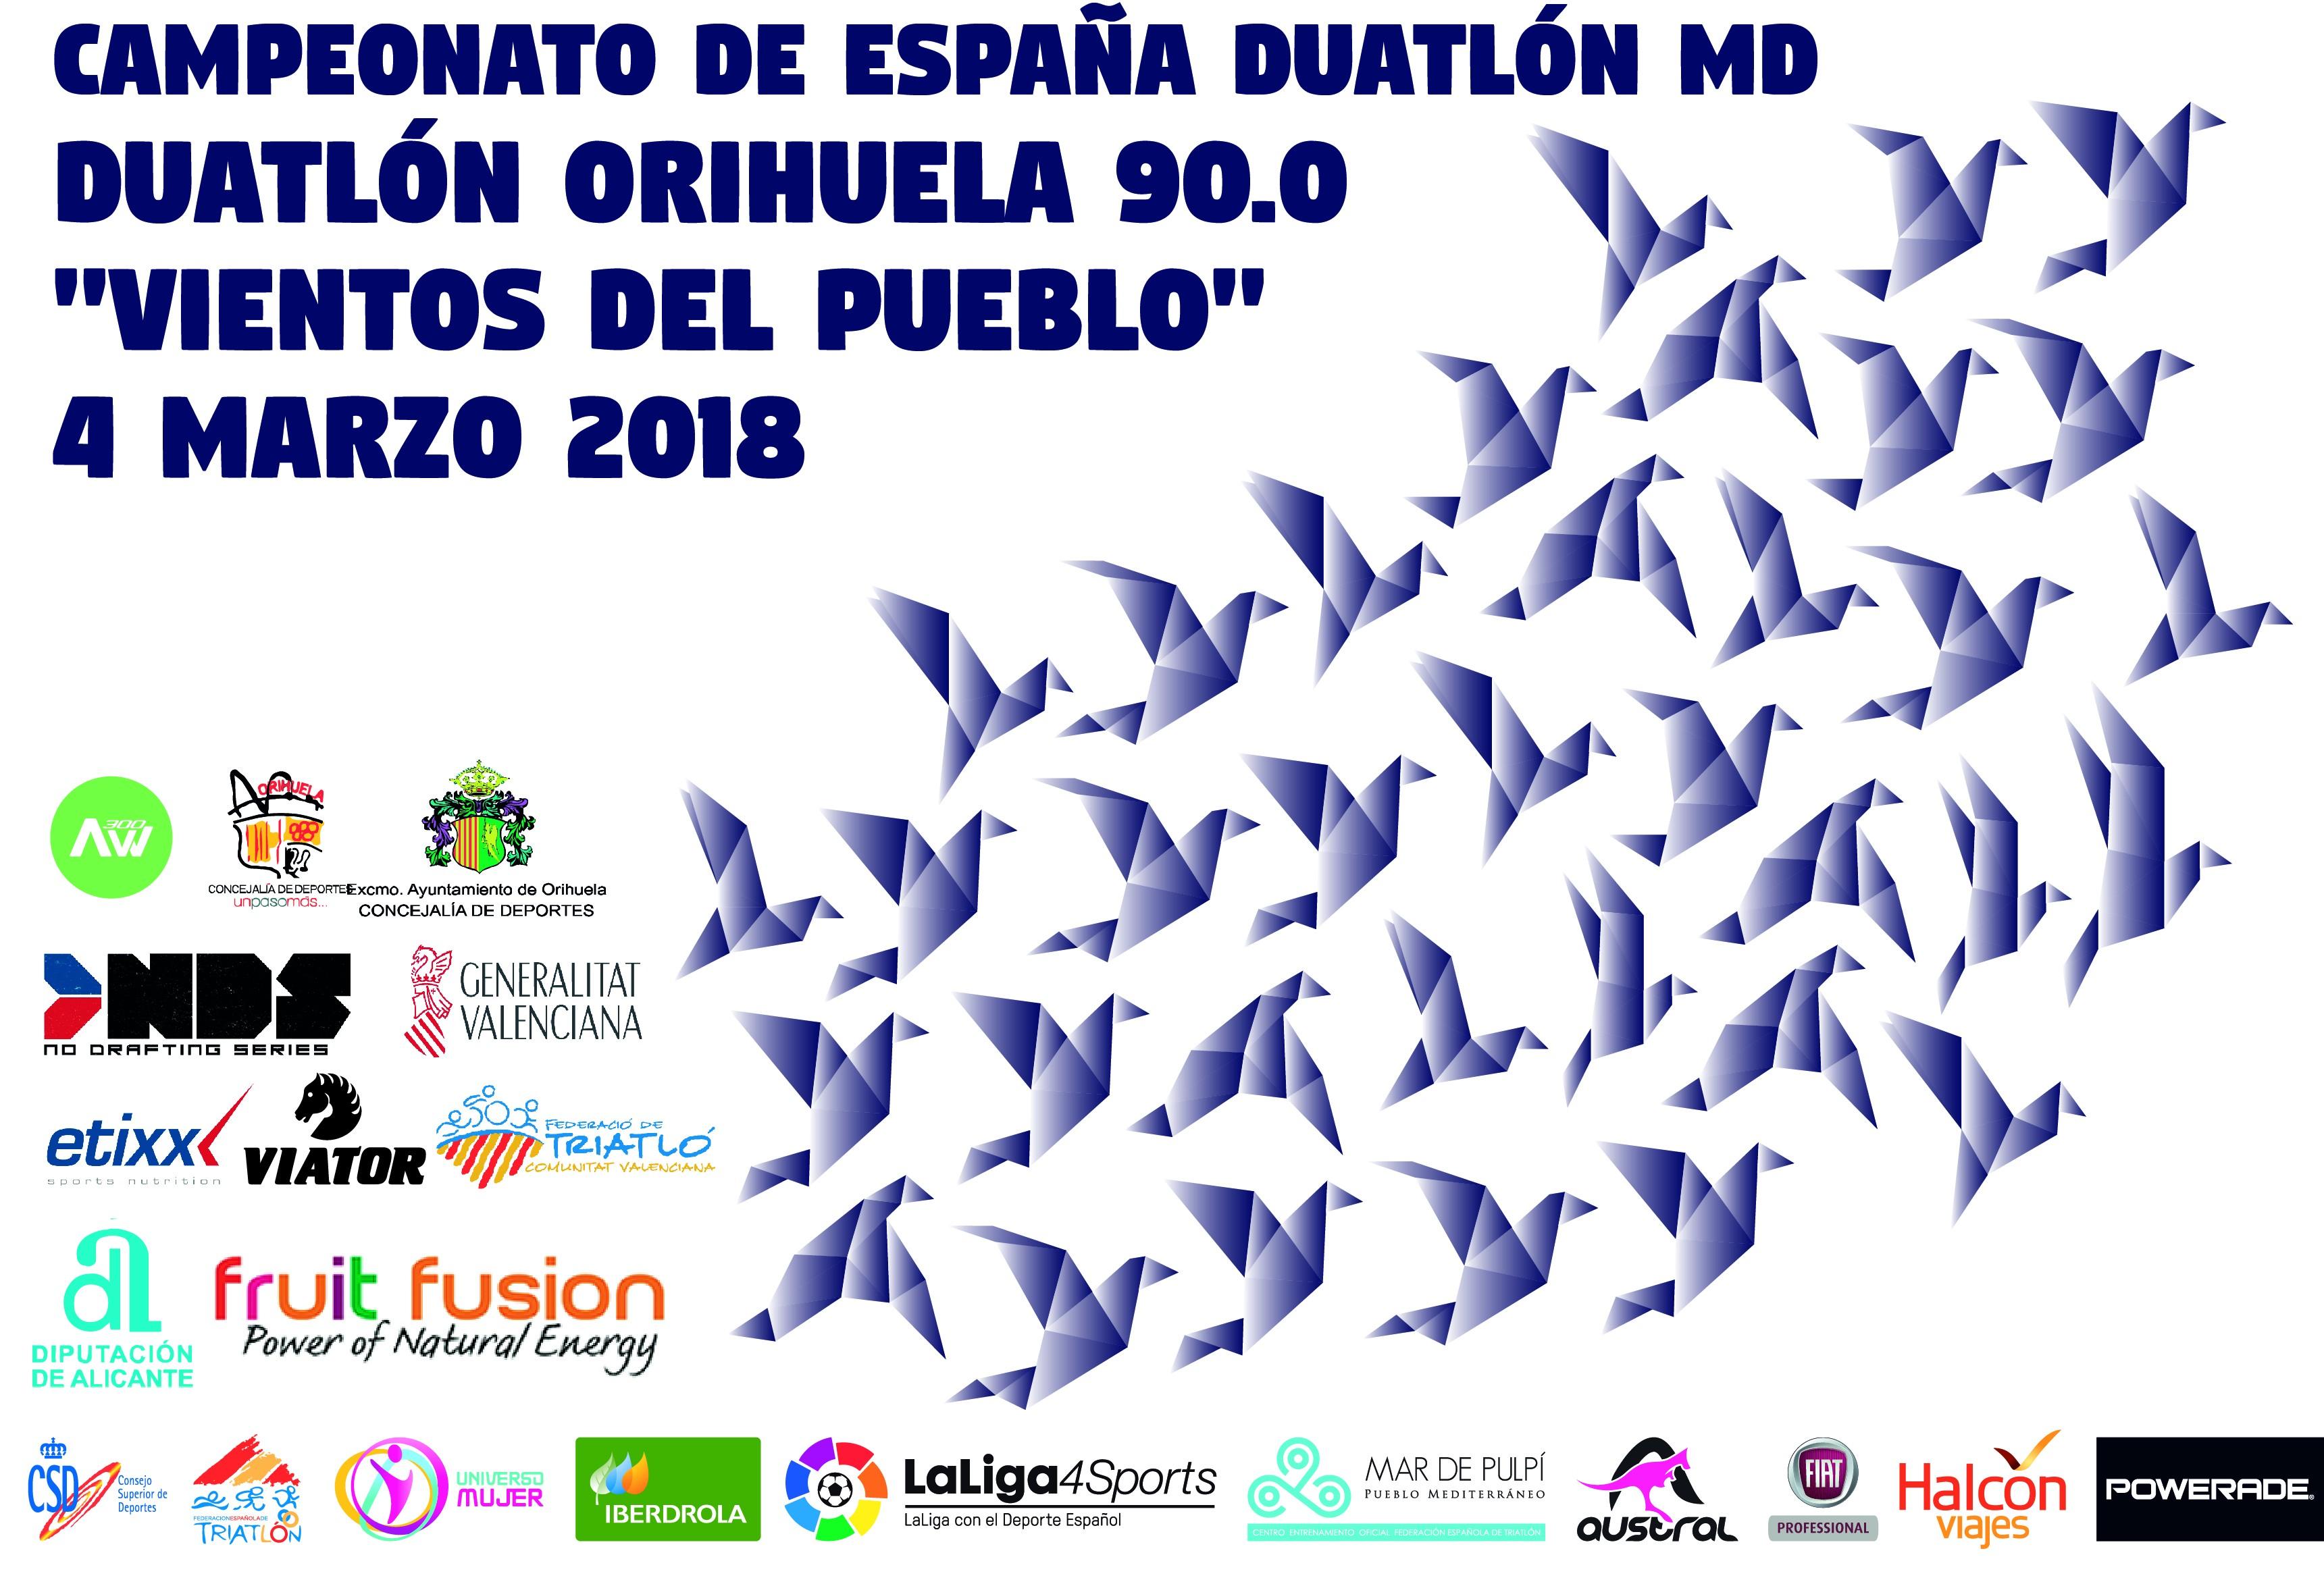 Orihuela Campeonato Esp Duatlon MD v AprobadaFINAL